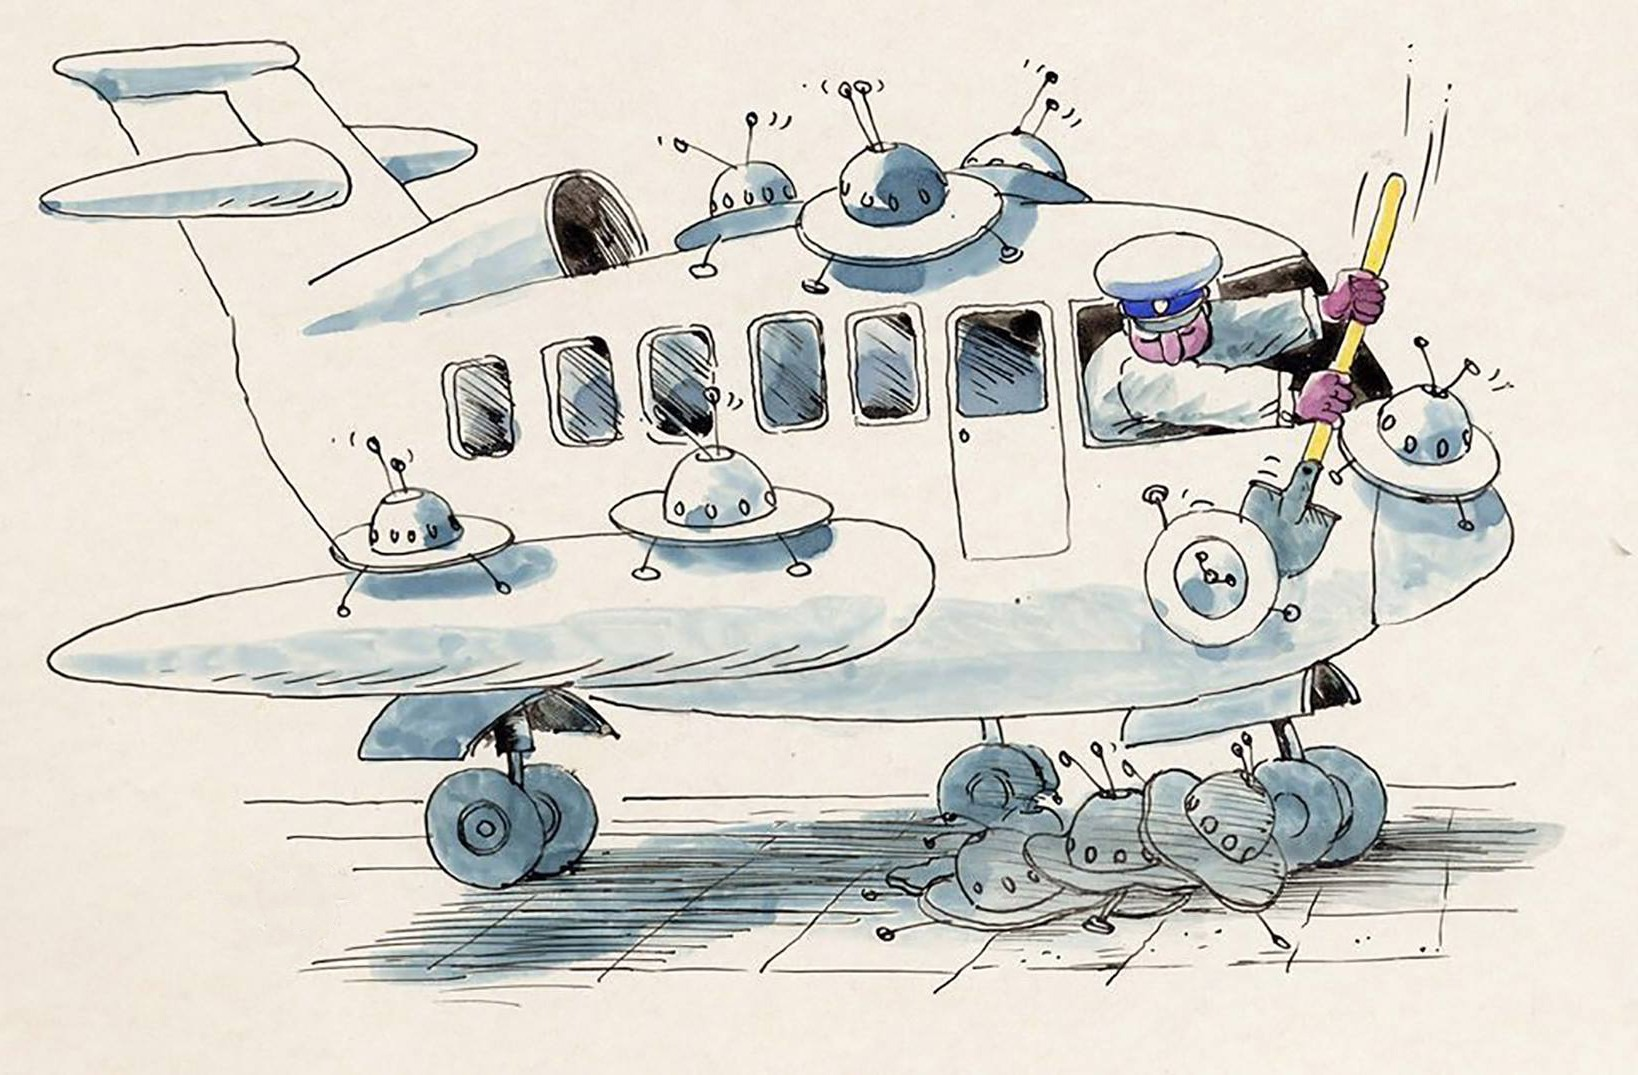 Картинки с самолетами приколы, открытки